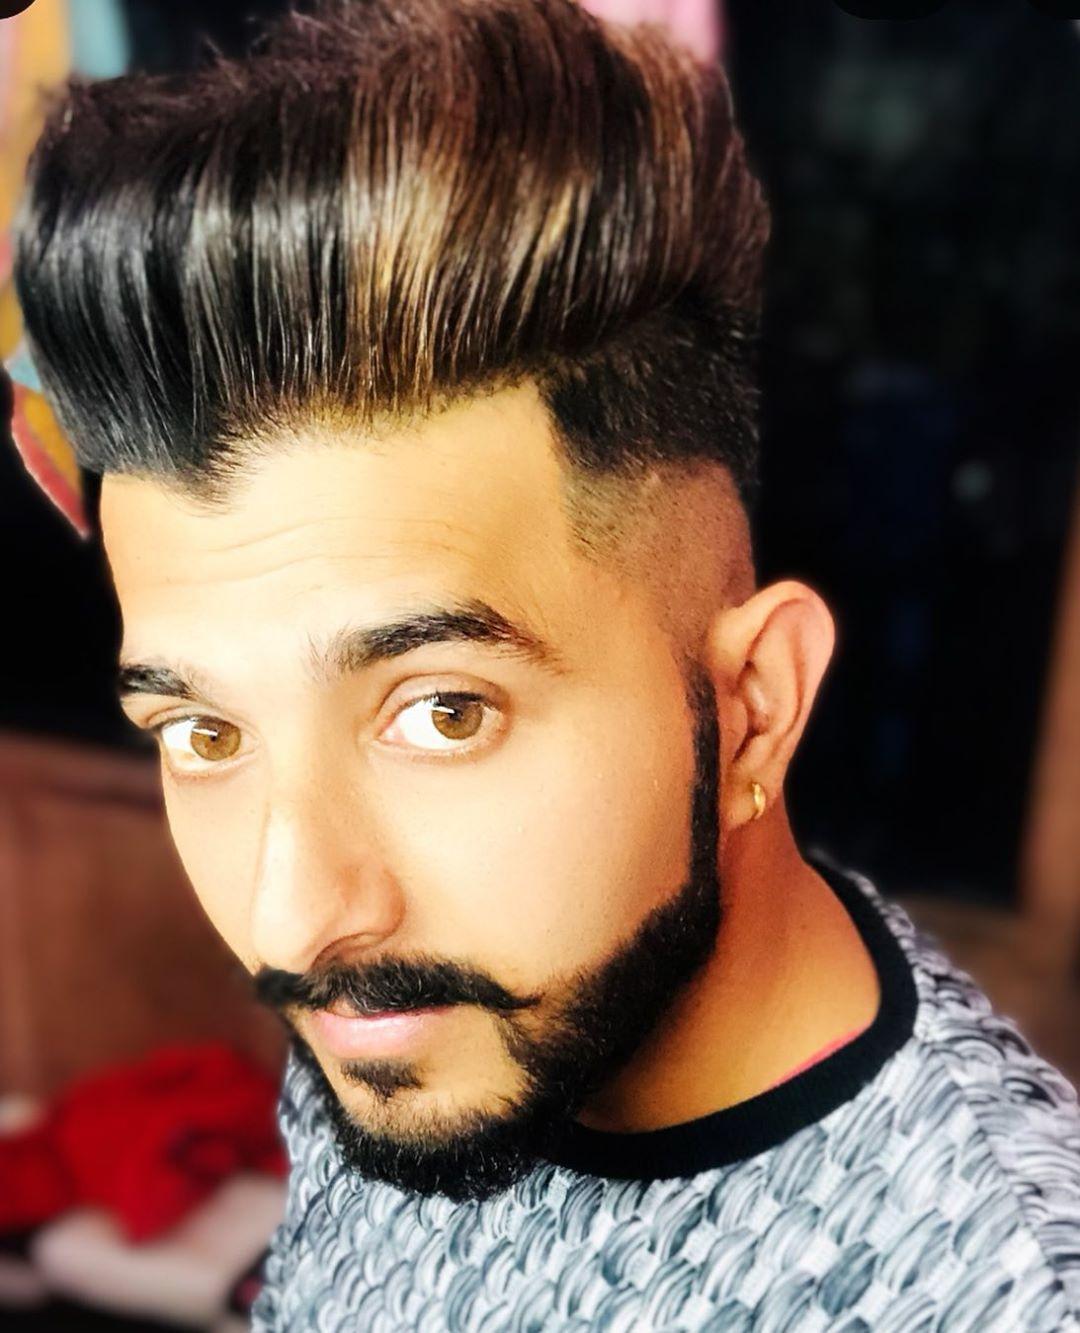 hairstyles #look #beardlook #stud #handsome #mrsammmy